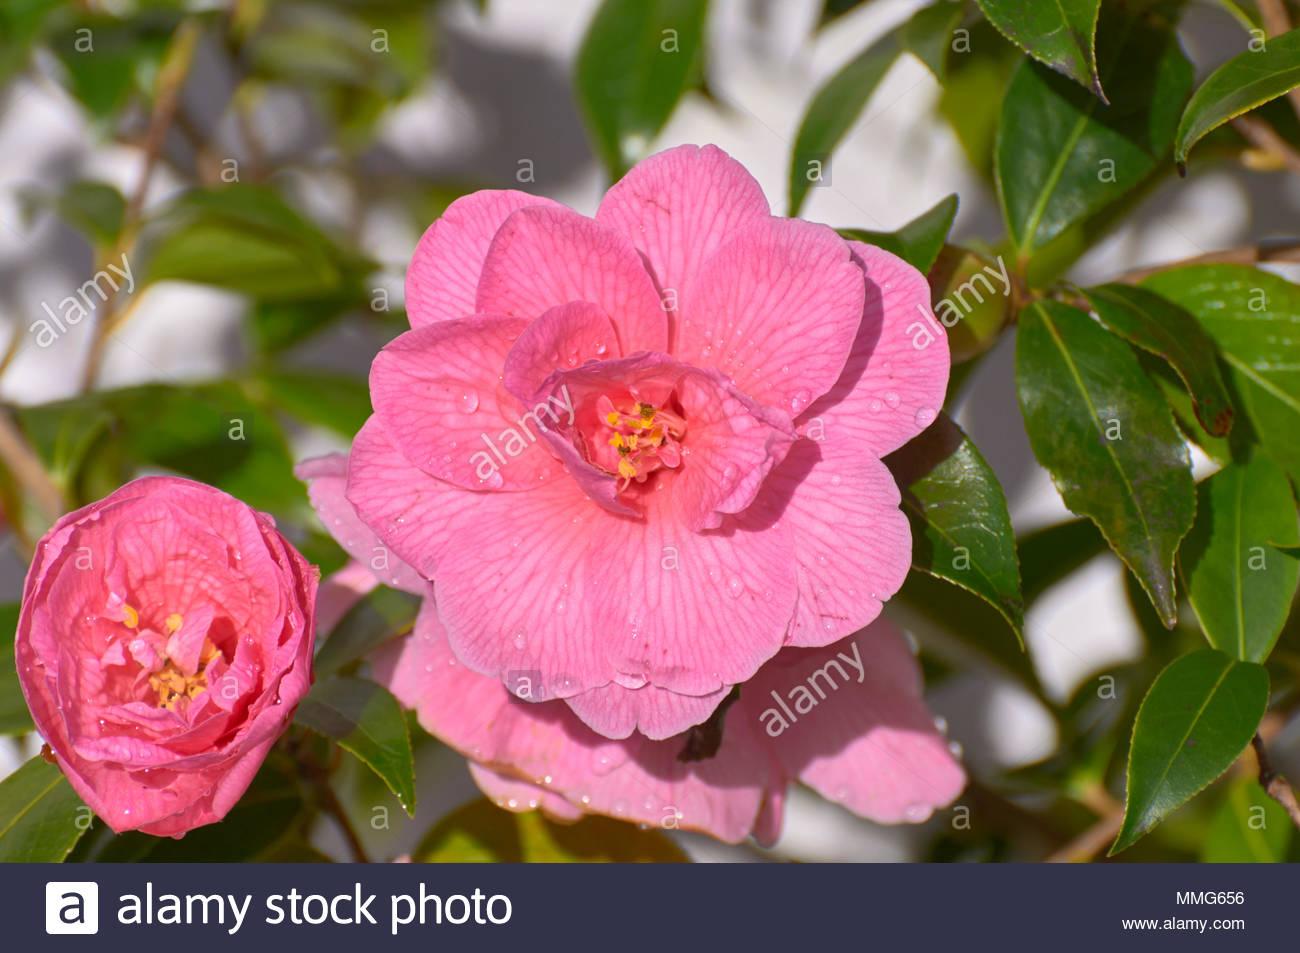 Rosa camelie Camelia sinensis arbusto in un britannico uk GIARDINO PRIMAVERA Immagini Stock